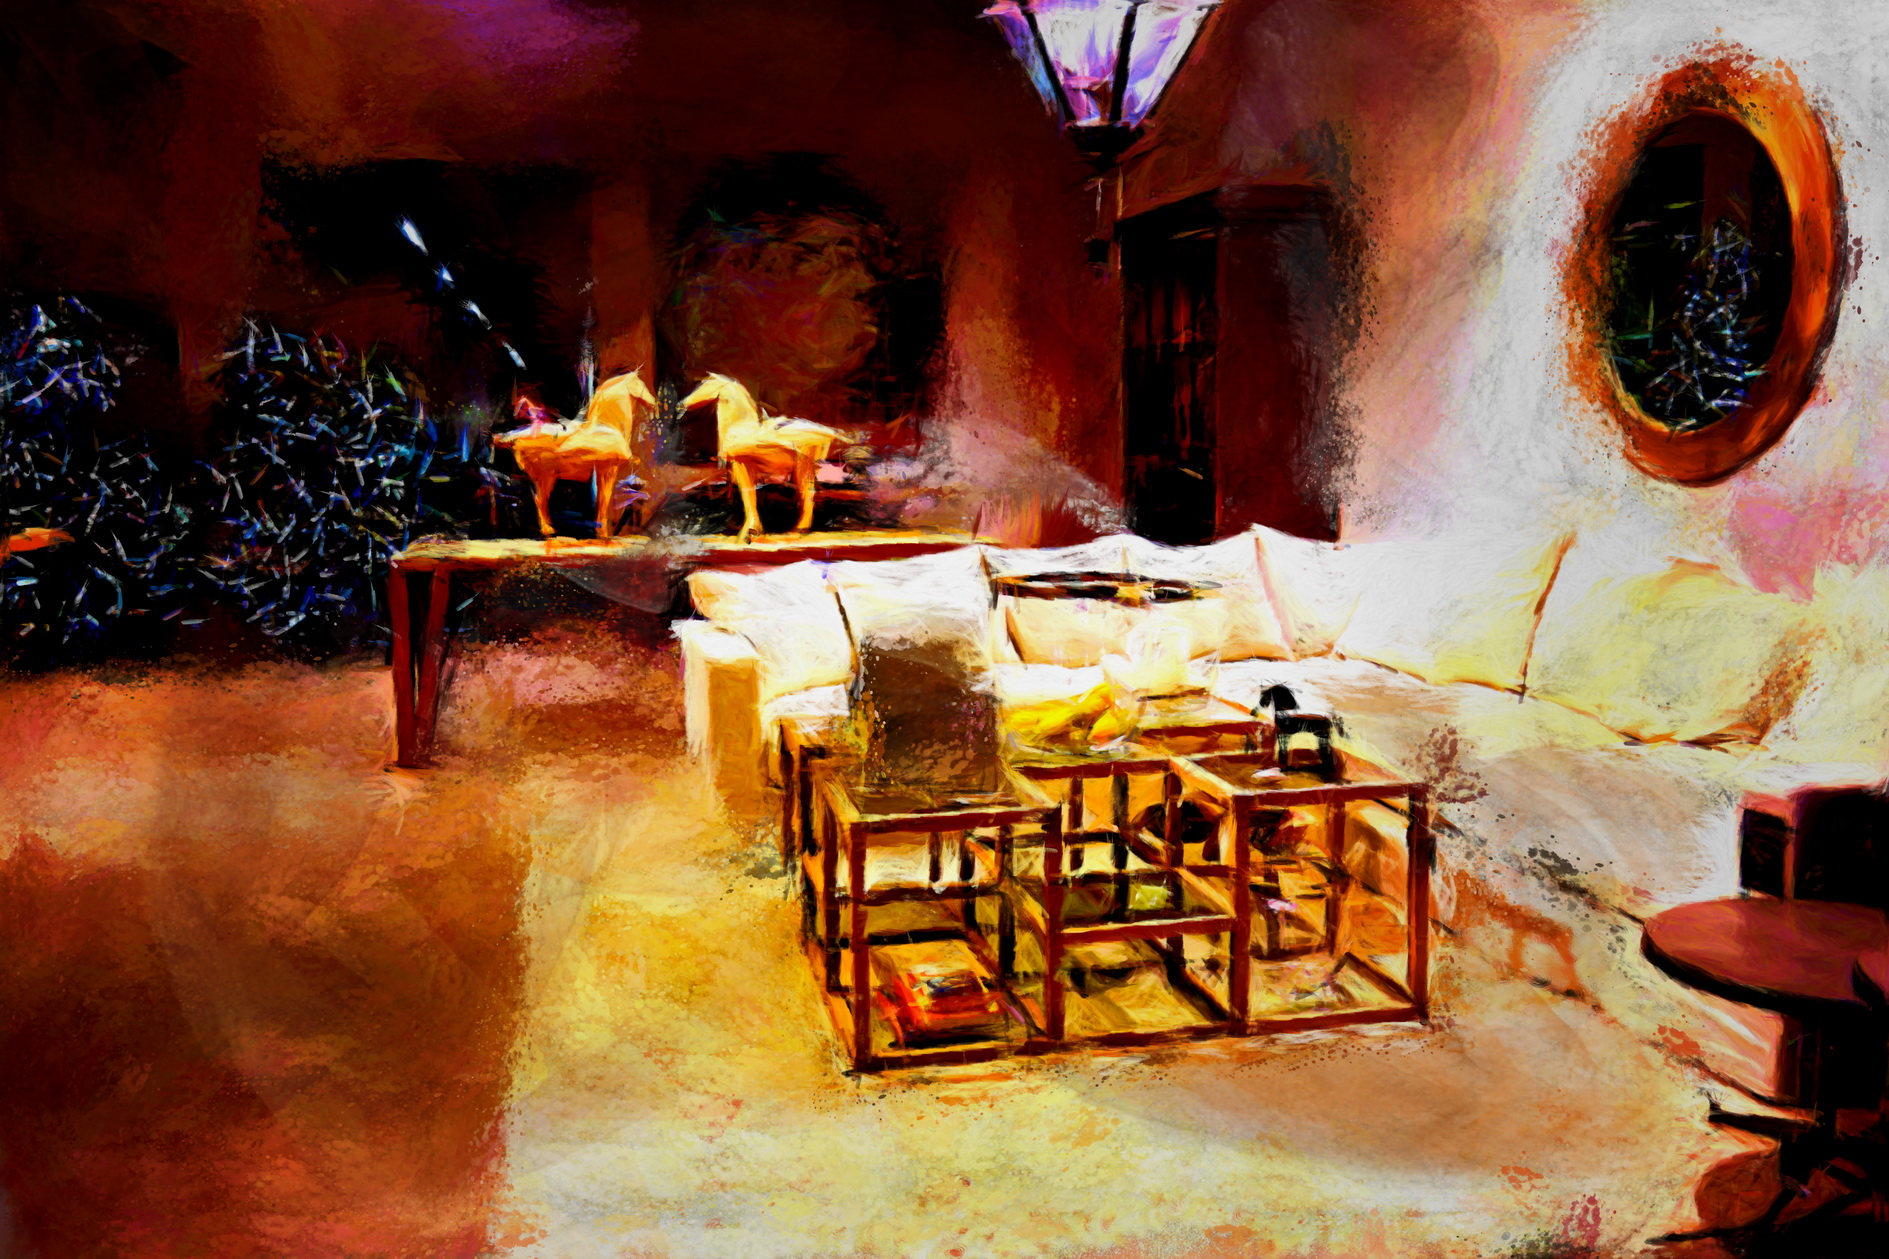 Peinture_de_Laure_Van_De_Meele_inspirée_par_Flamant_Home_Interiors